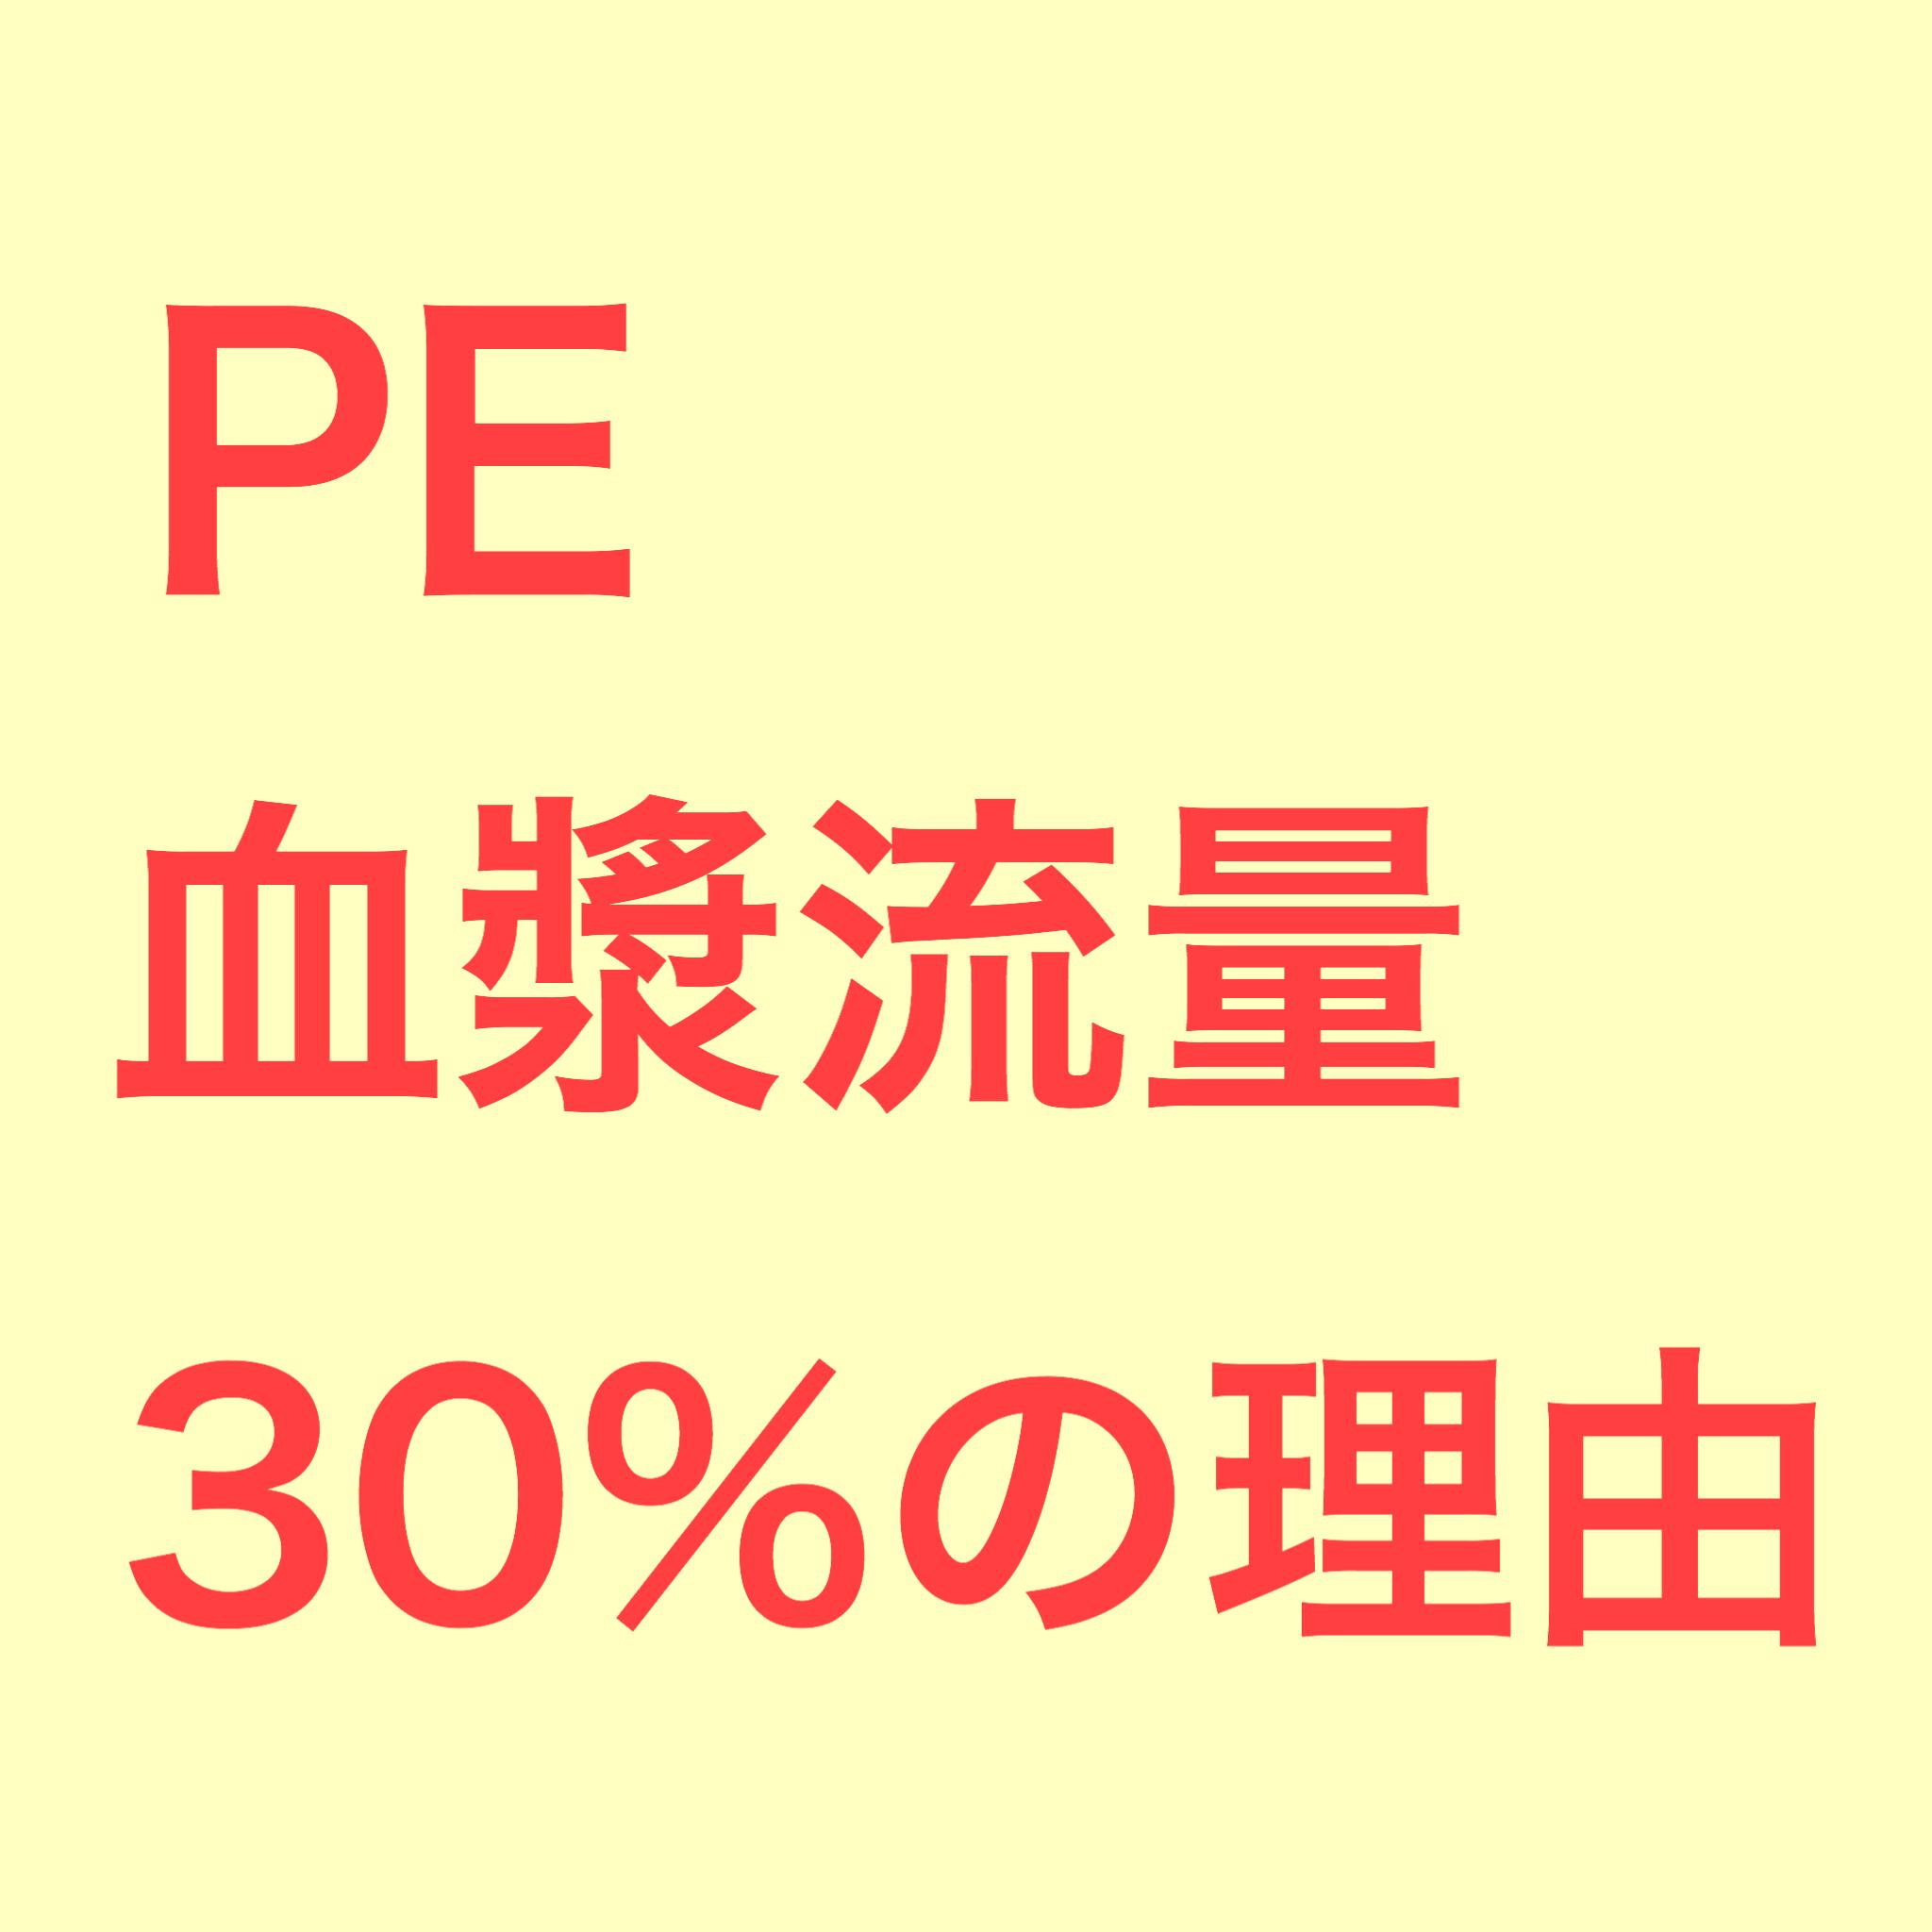 PE 血漿流量30%の理由 〜濃度分極層と血漿分離抵抗〜